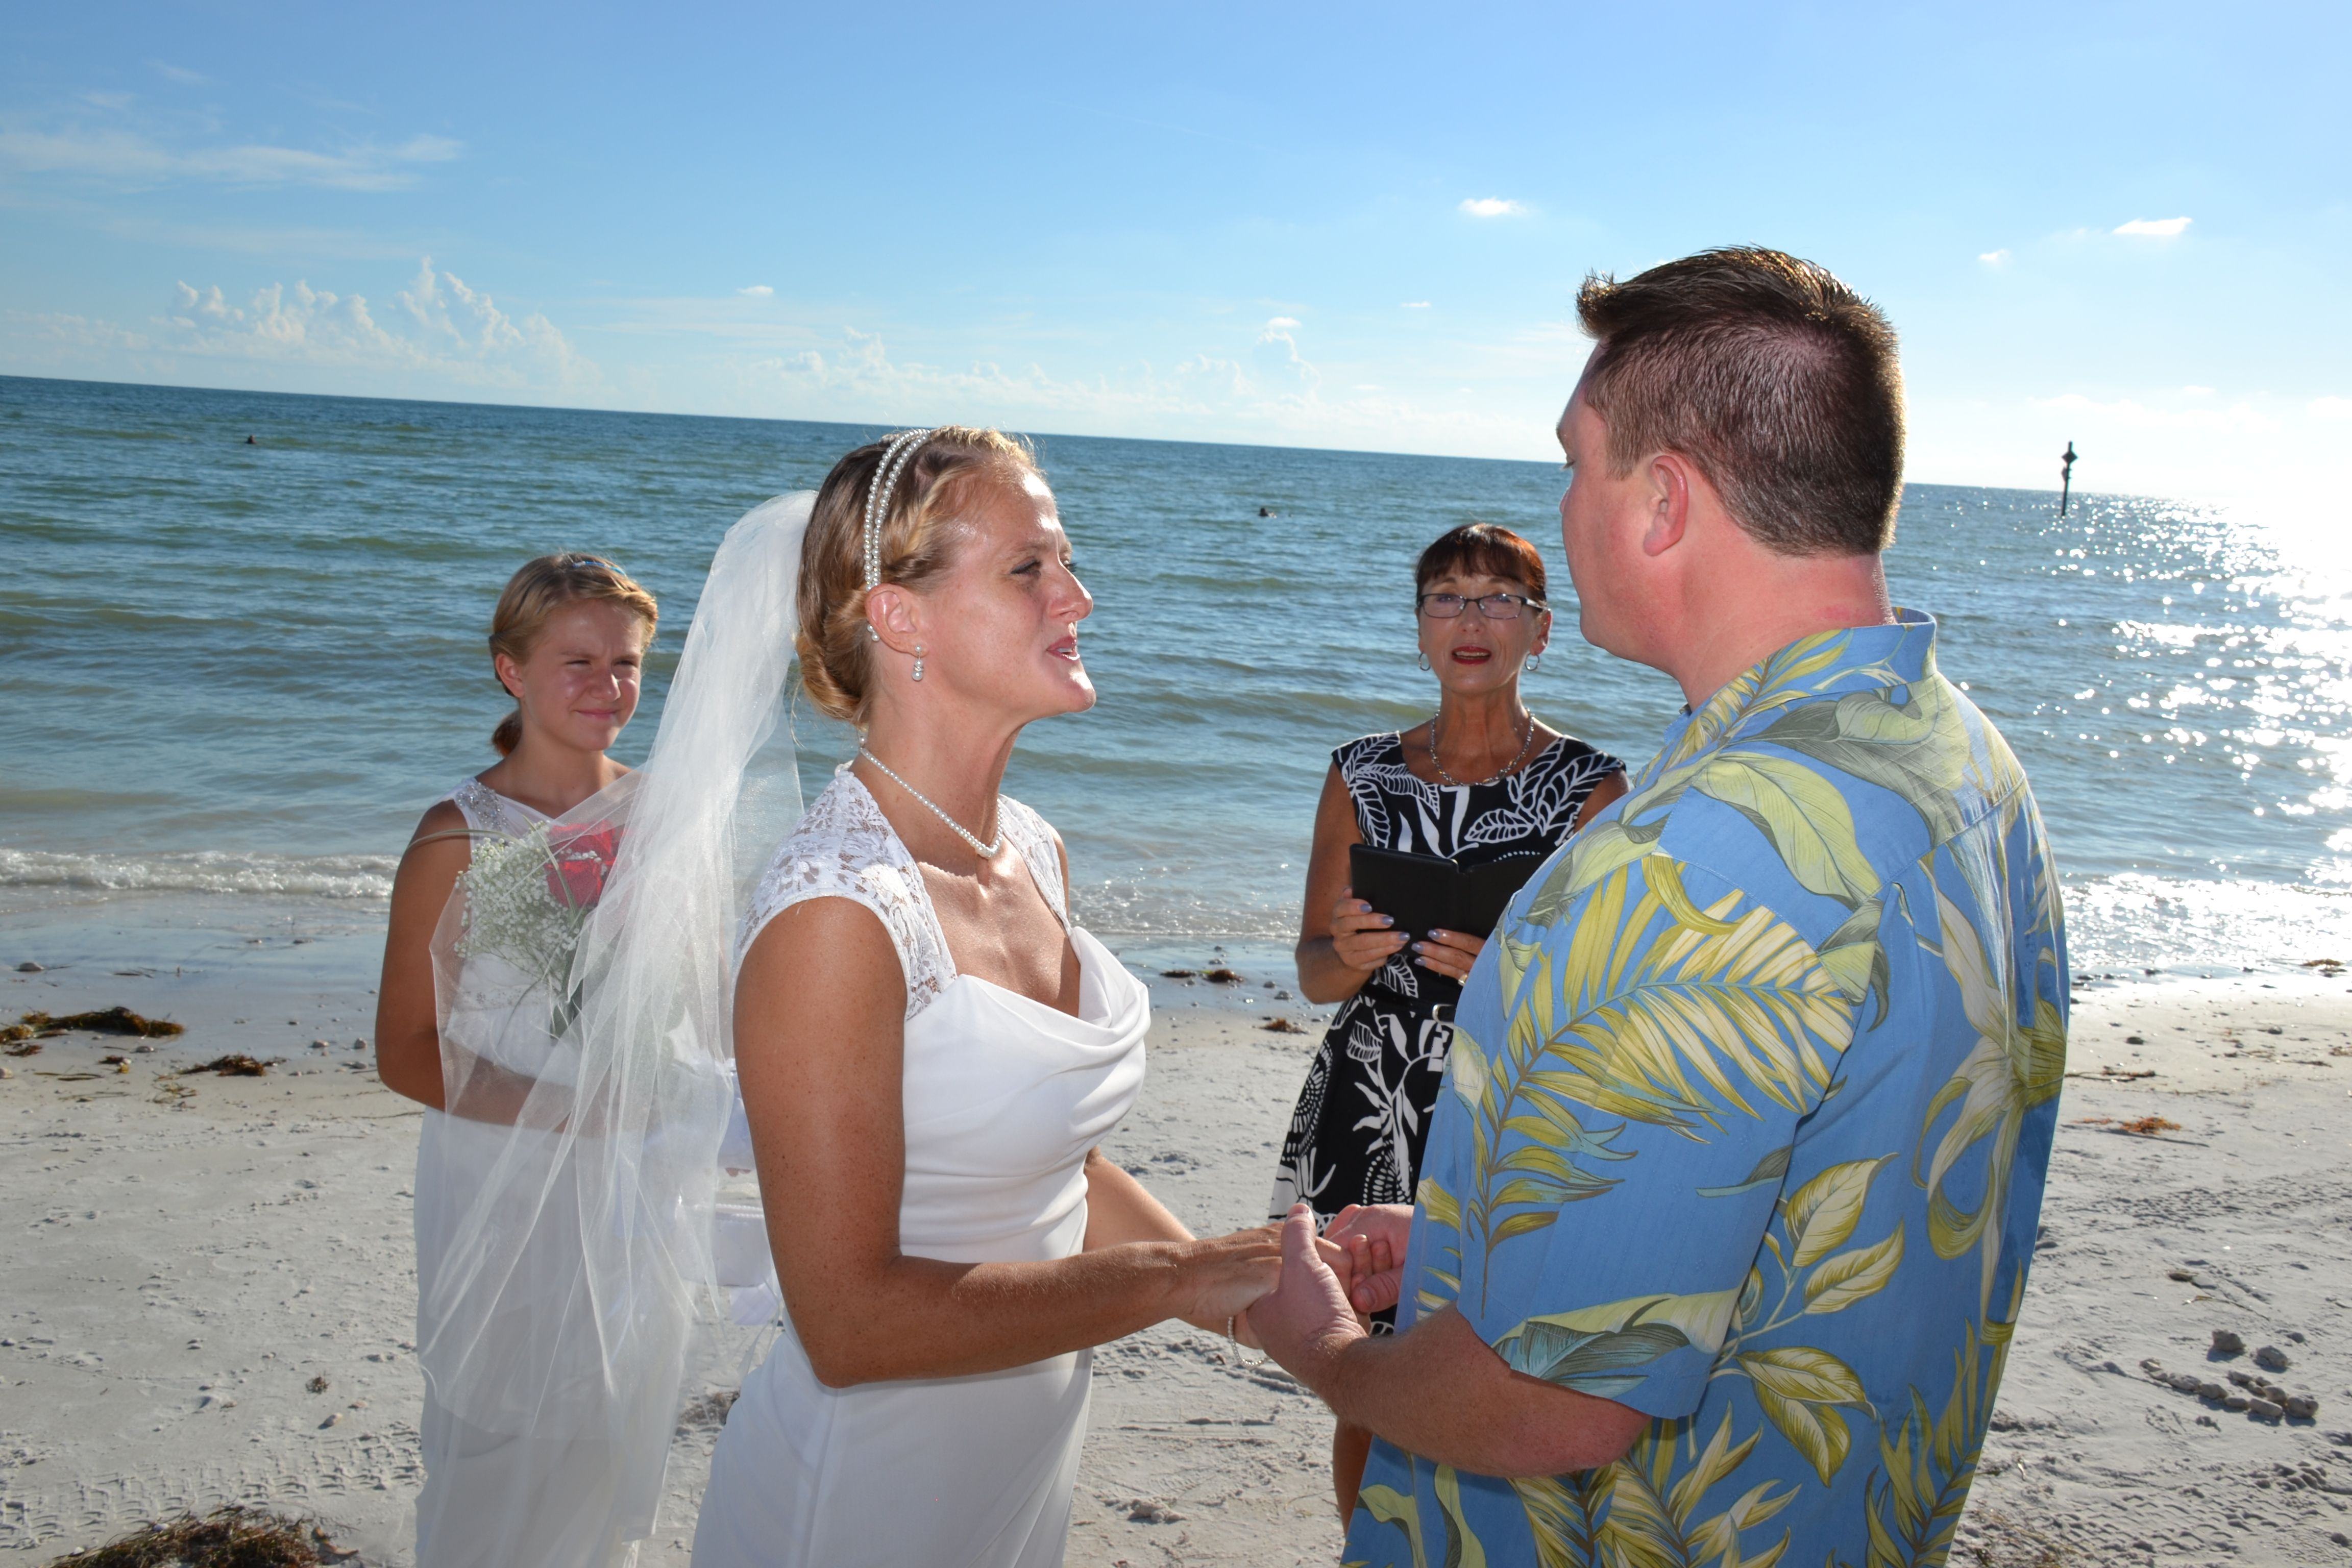 Honeymoon Island Beach Wedding Beautiful Sunny Day Non Denominational Ceremony Elopement Destination